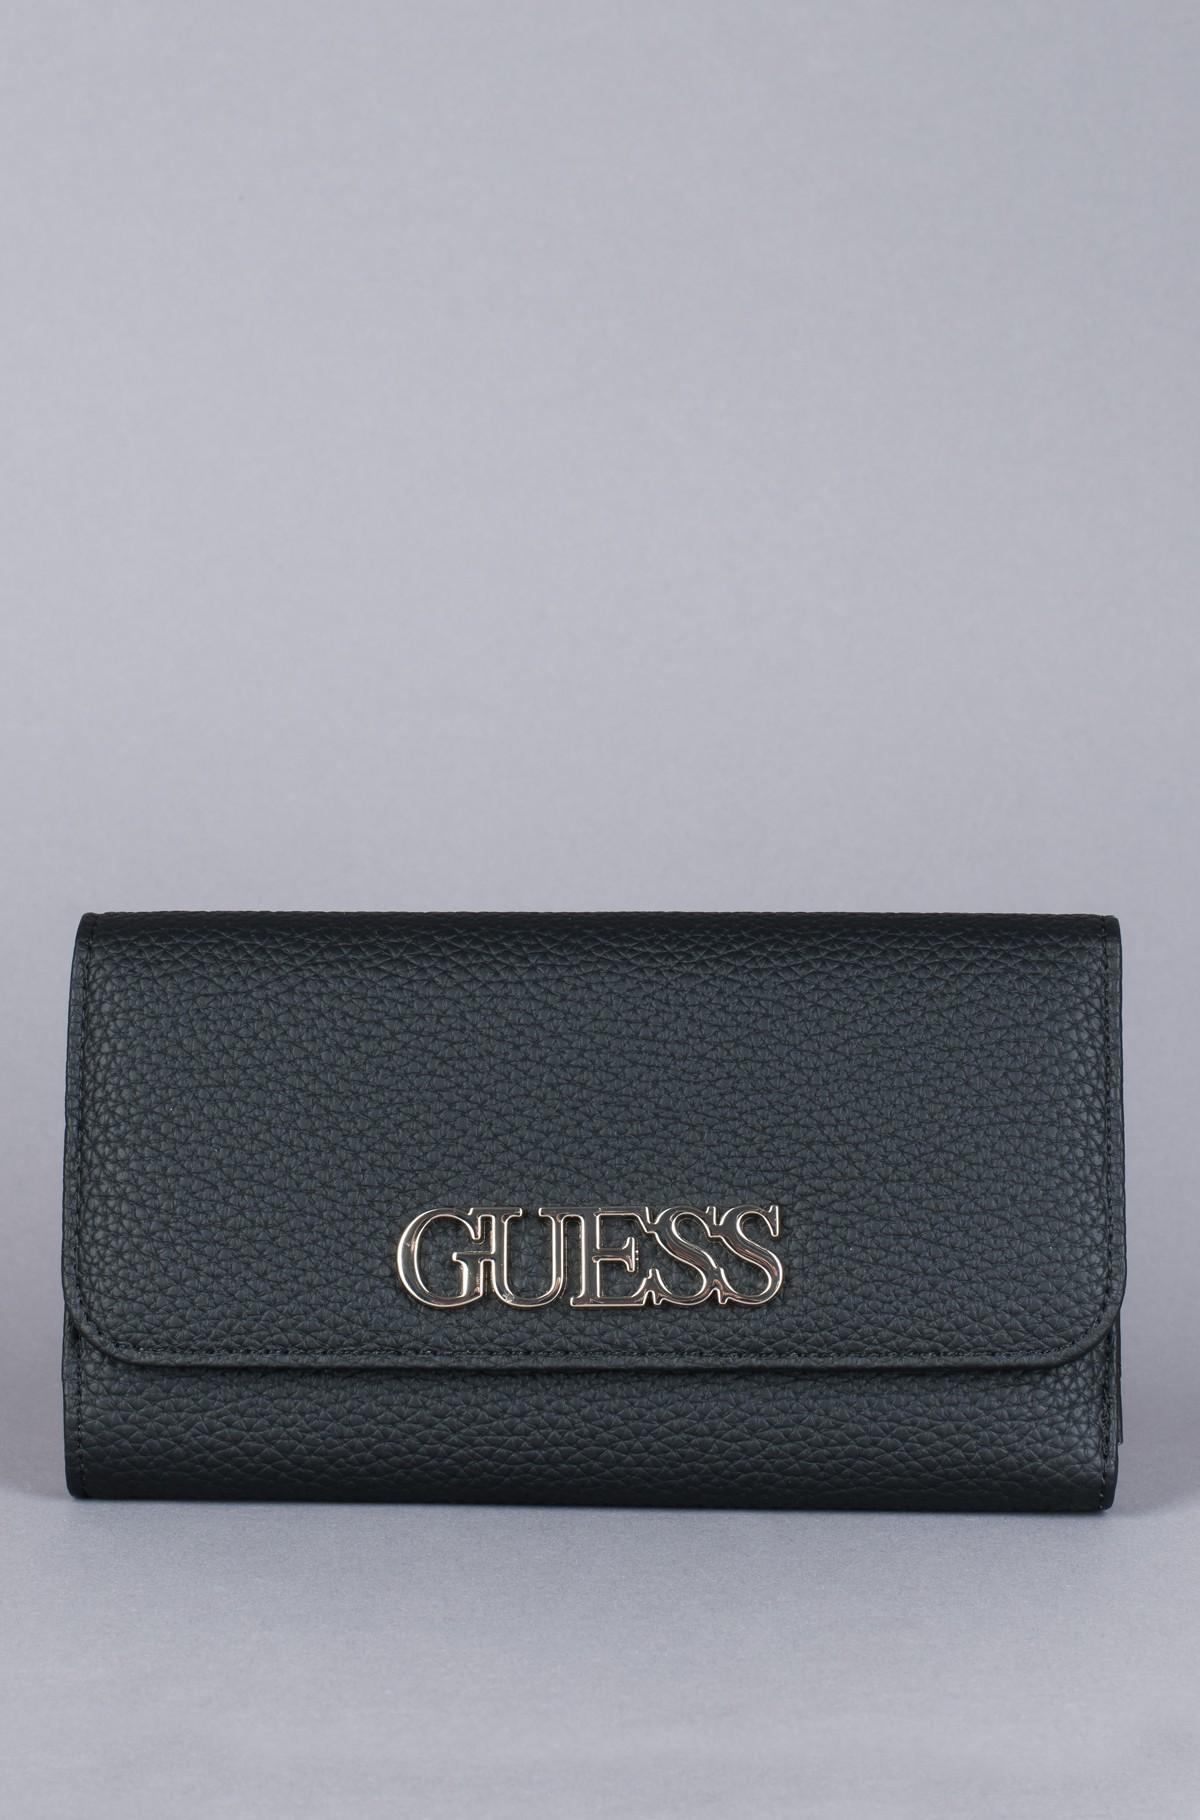 Wallet SWVG73 01650-full-1